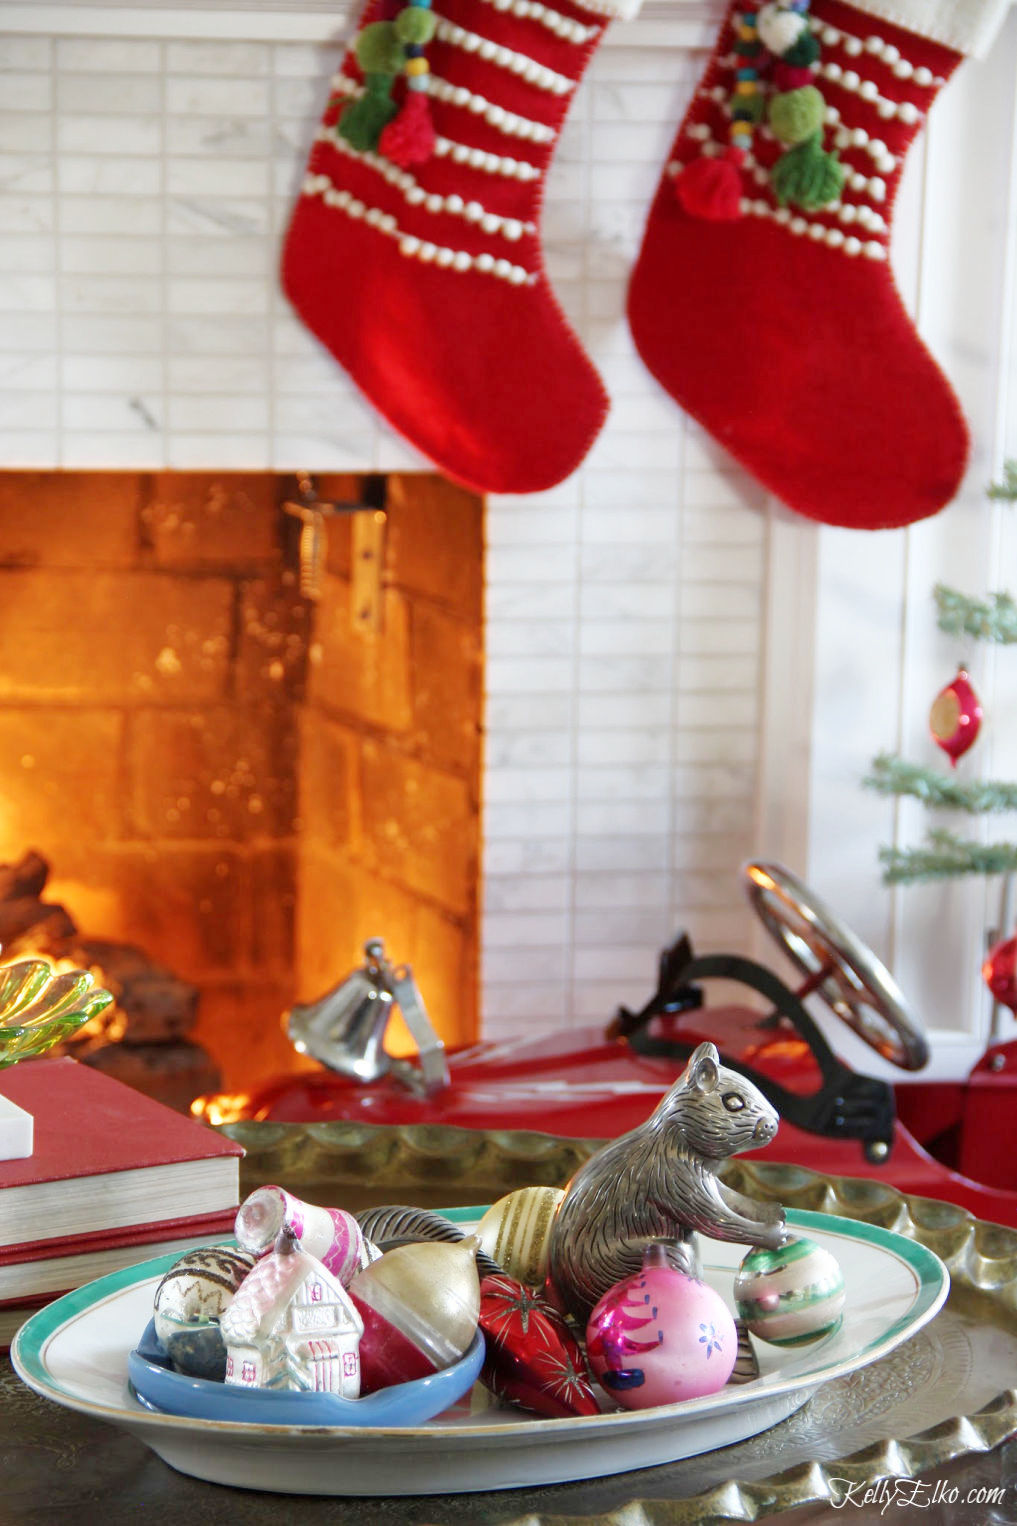 Christmas display of old ornaments on a vintage platter kellyelko.com #christmas #christmasdecor #christmasdecorating #christmashome #christmastour #diychristmas #christmasideas #christmasmantel #christmastree #christmasornaments #vintagechristmas #farmhousechristmas #colorfulchristmas #creativechristmas #kellyelko #shinybrites